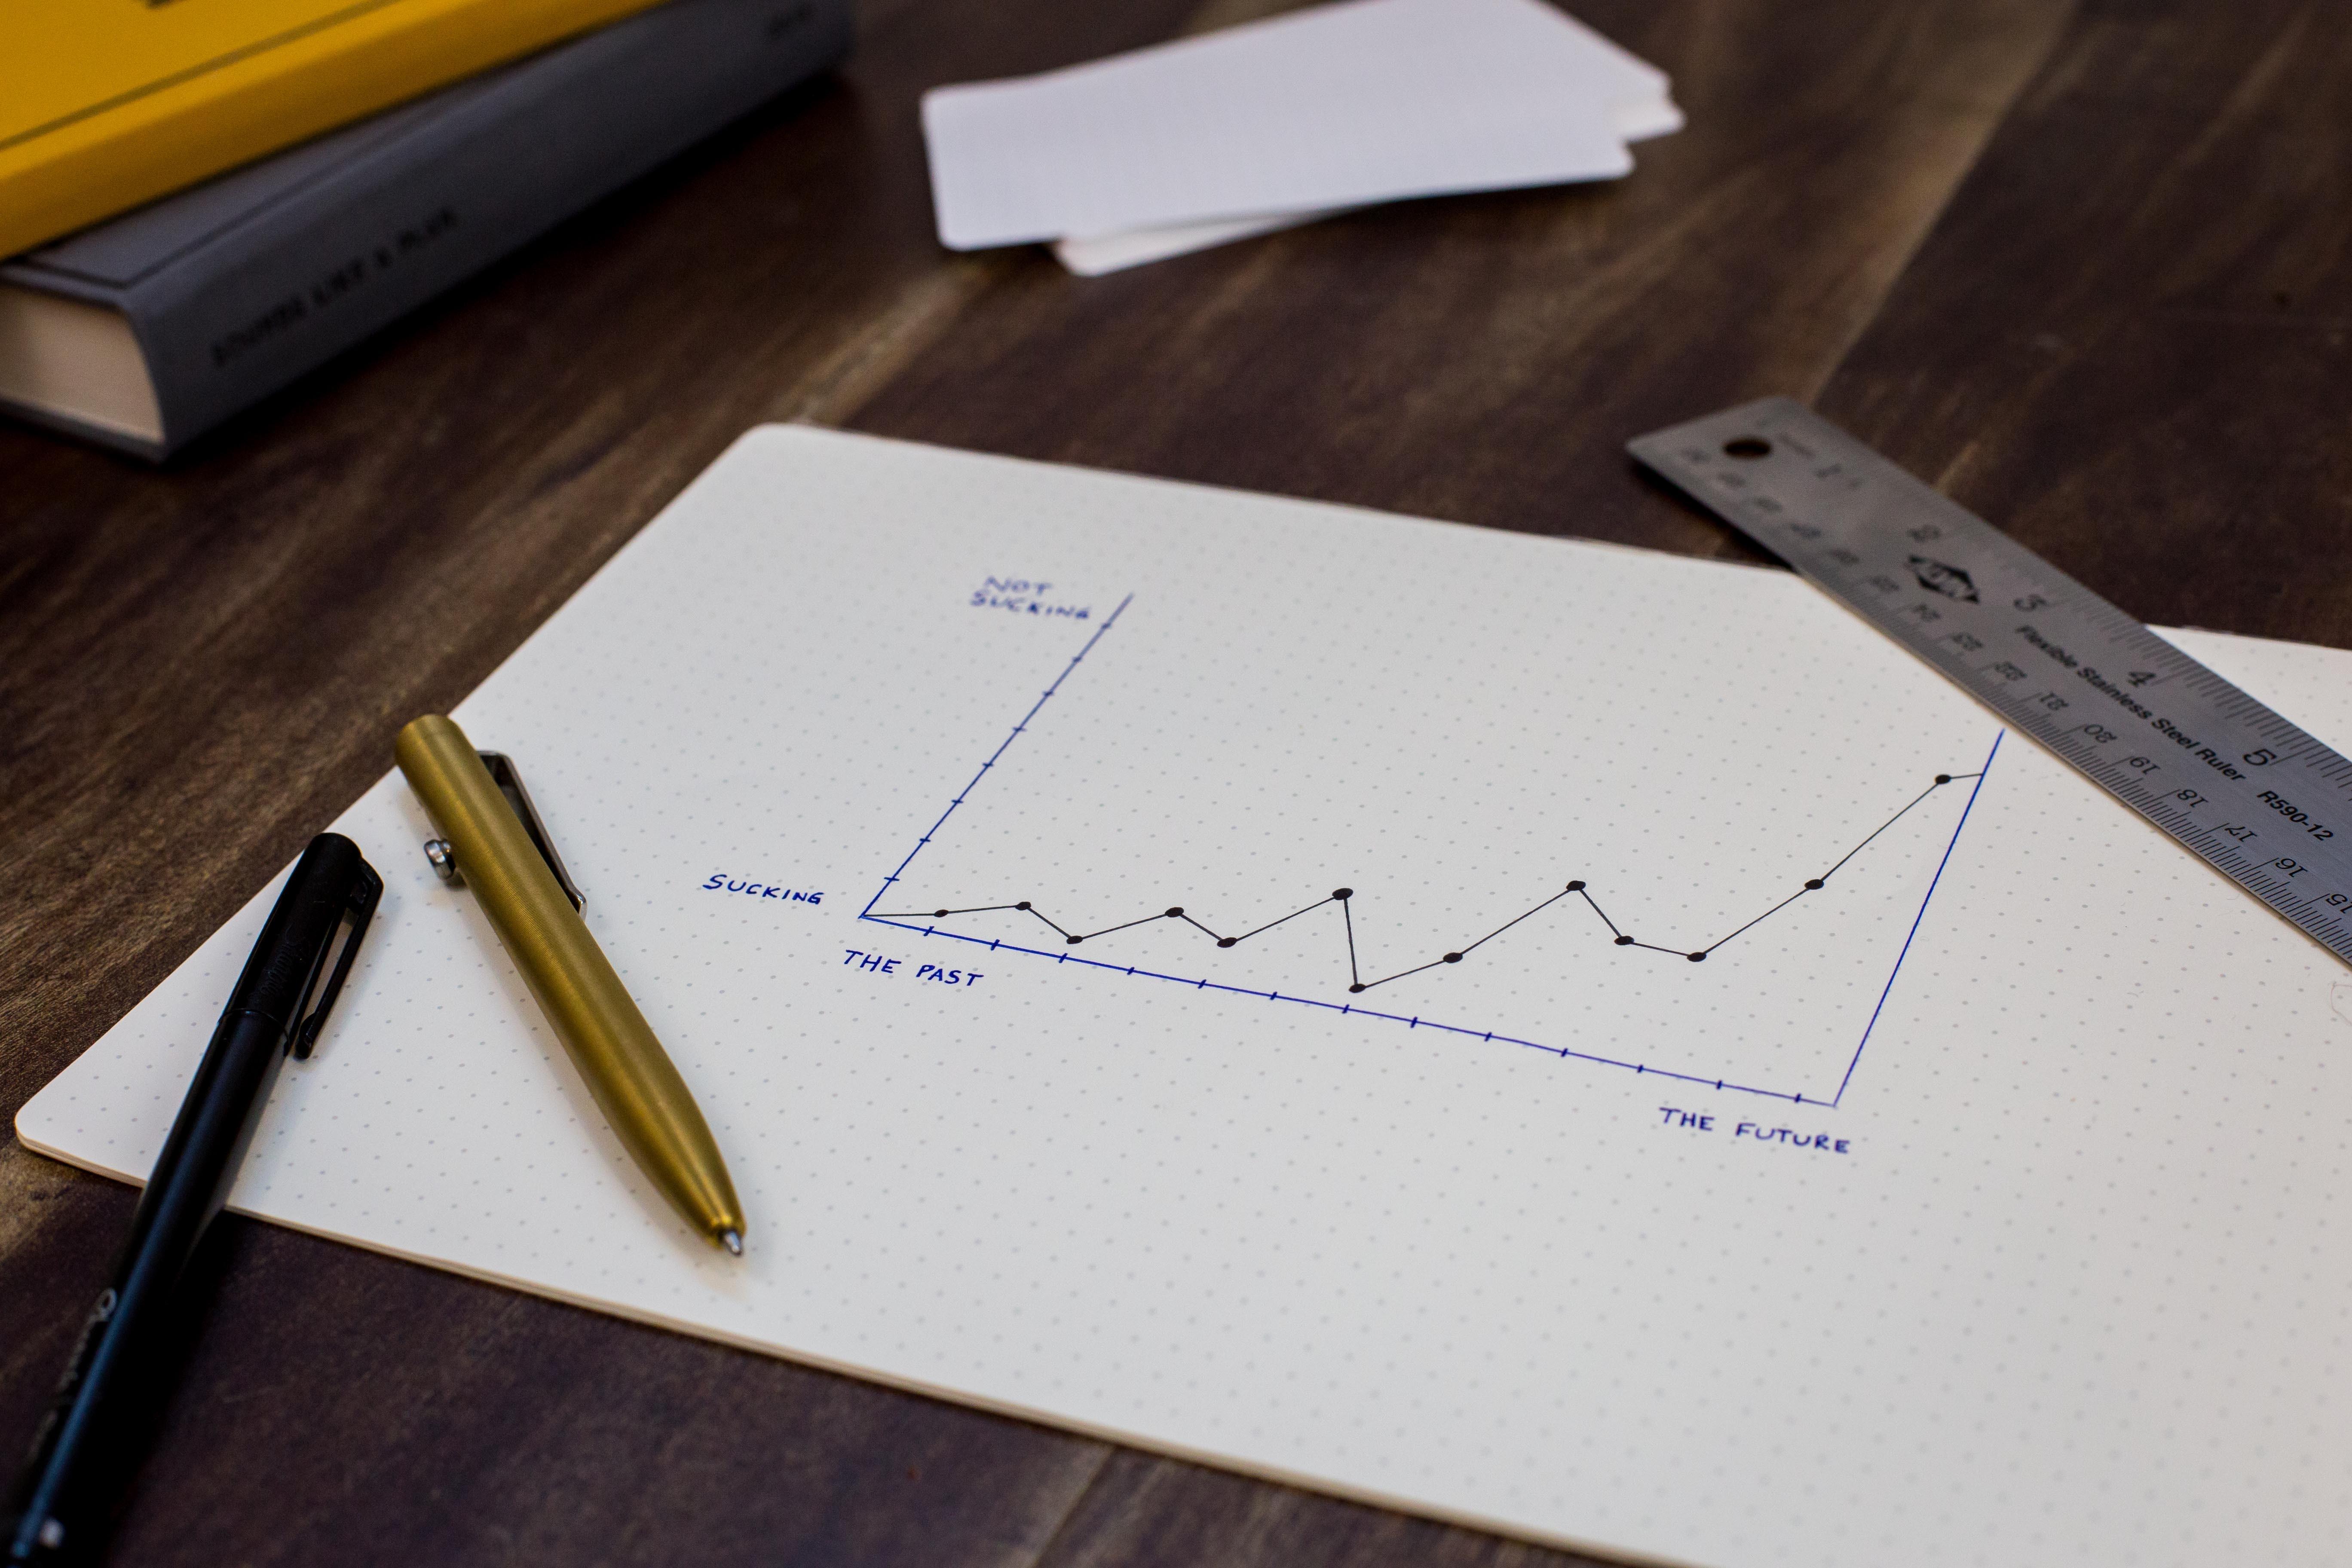 Progress report template prepared by Decktopus Content Team